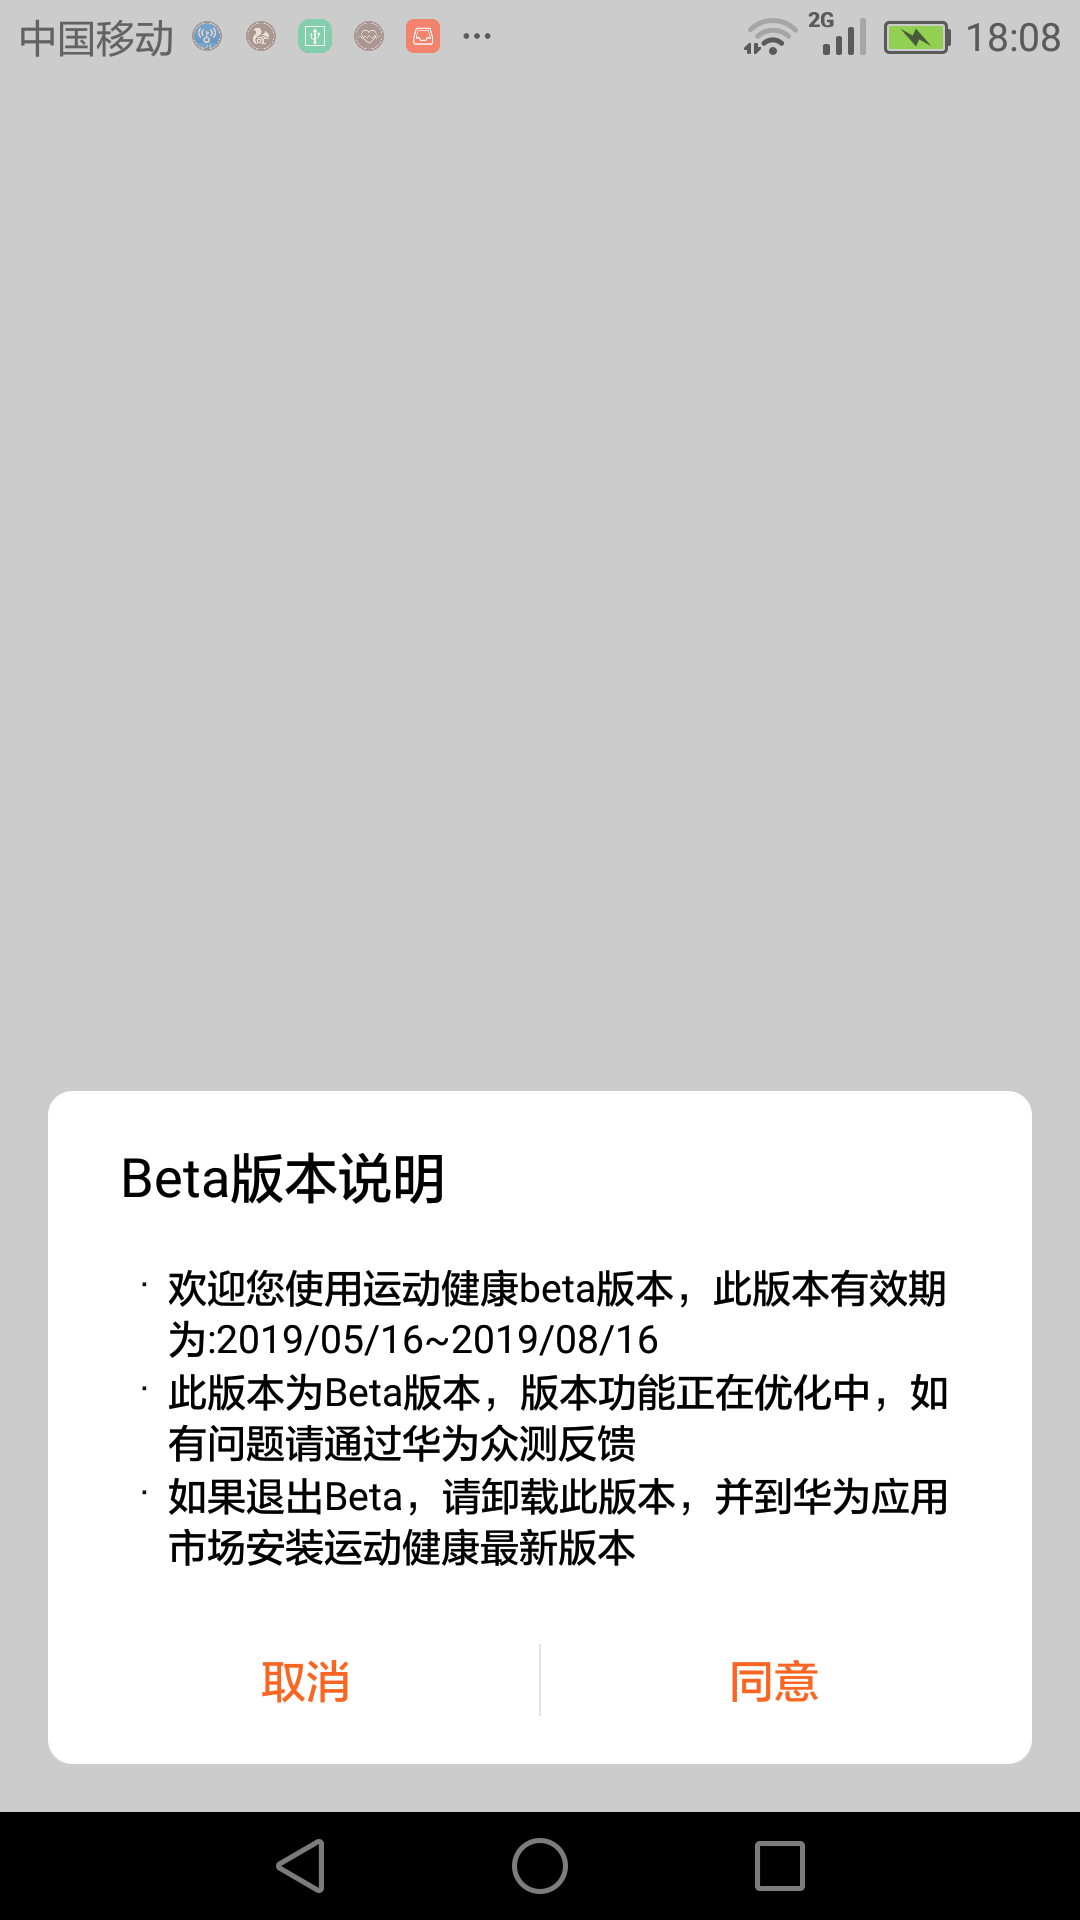 Screenshot_2019-07-02-18-08-56.png